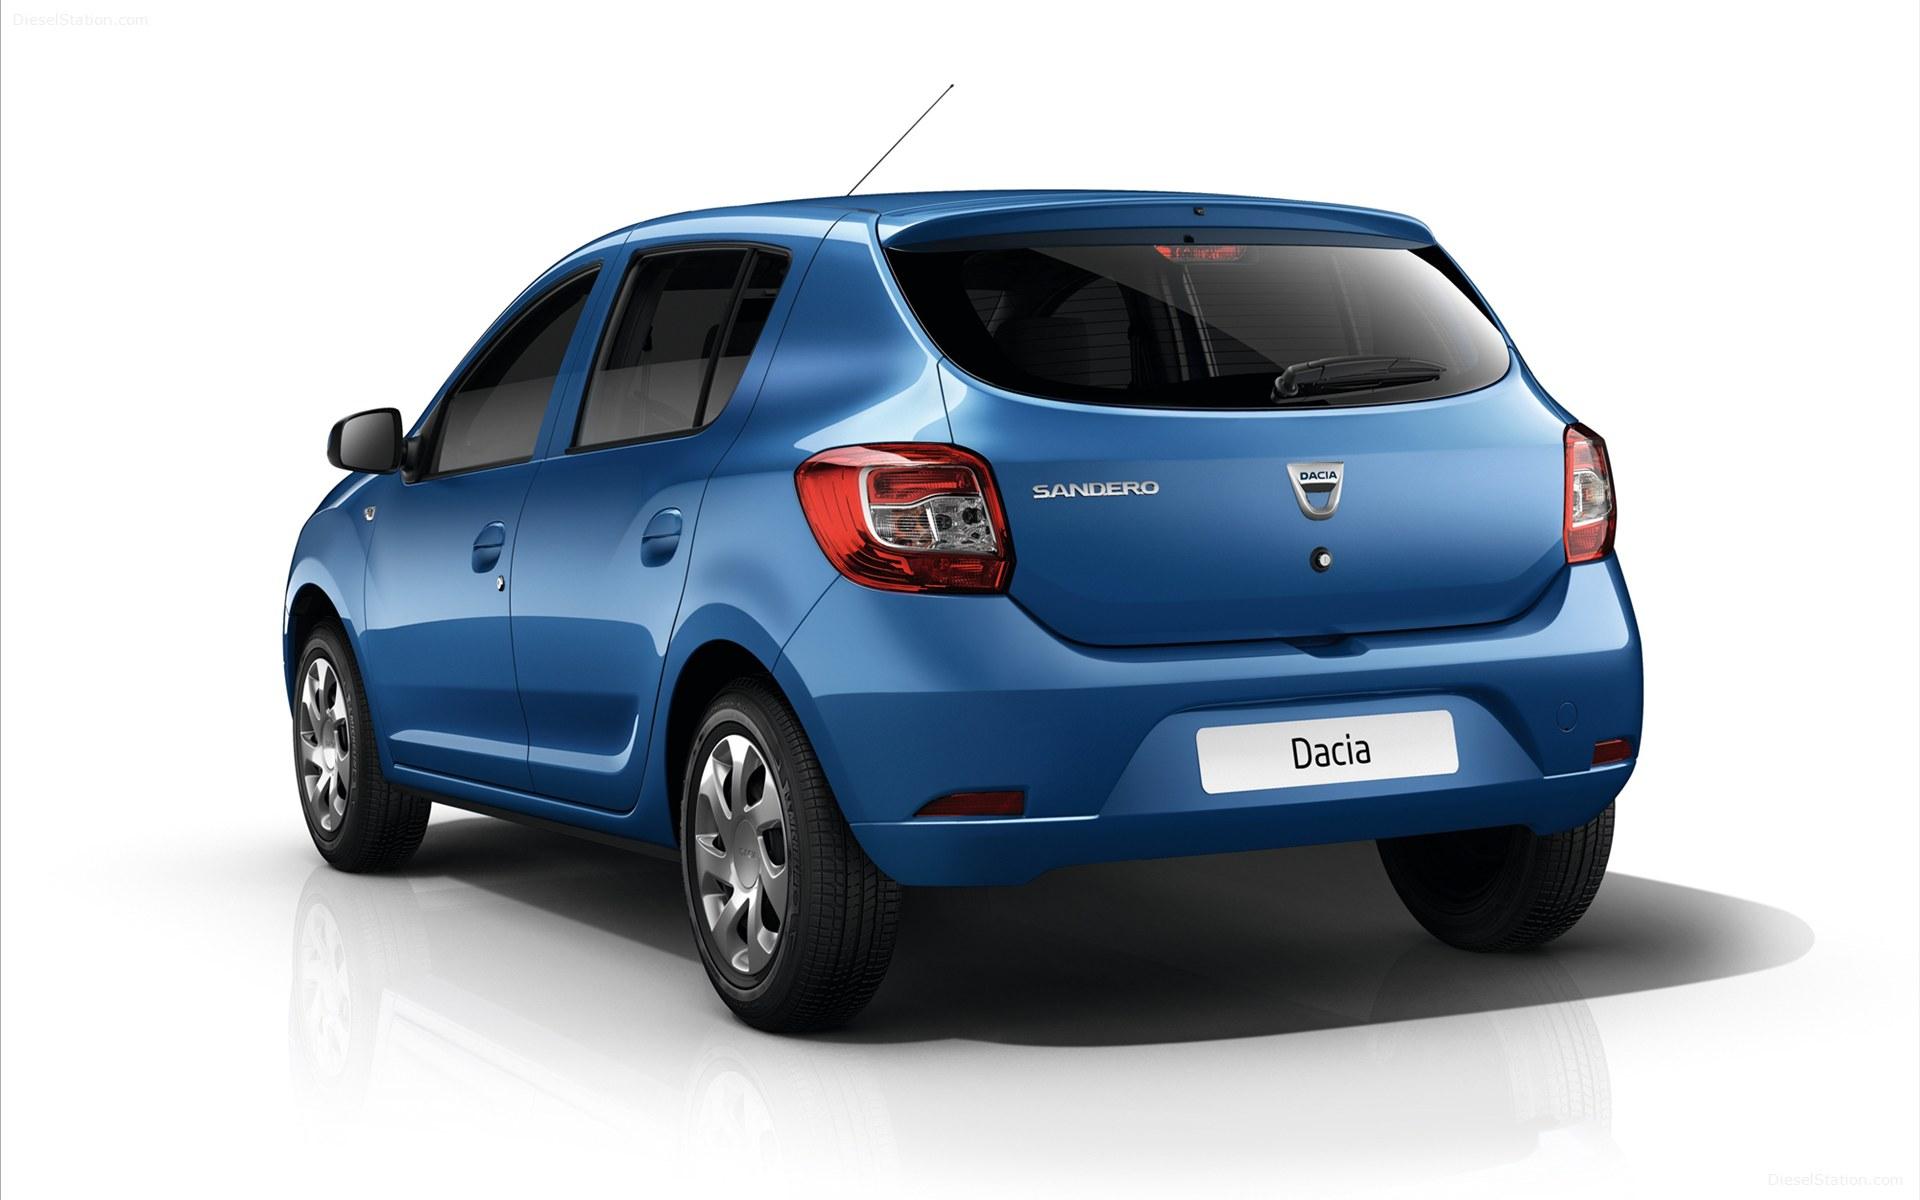 Dacia Cars 8 High Resolution Wallpaper